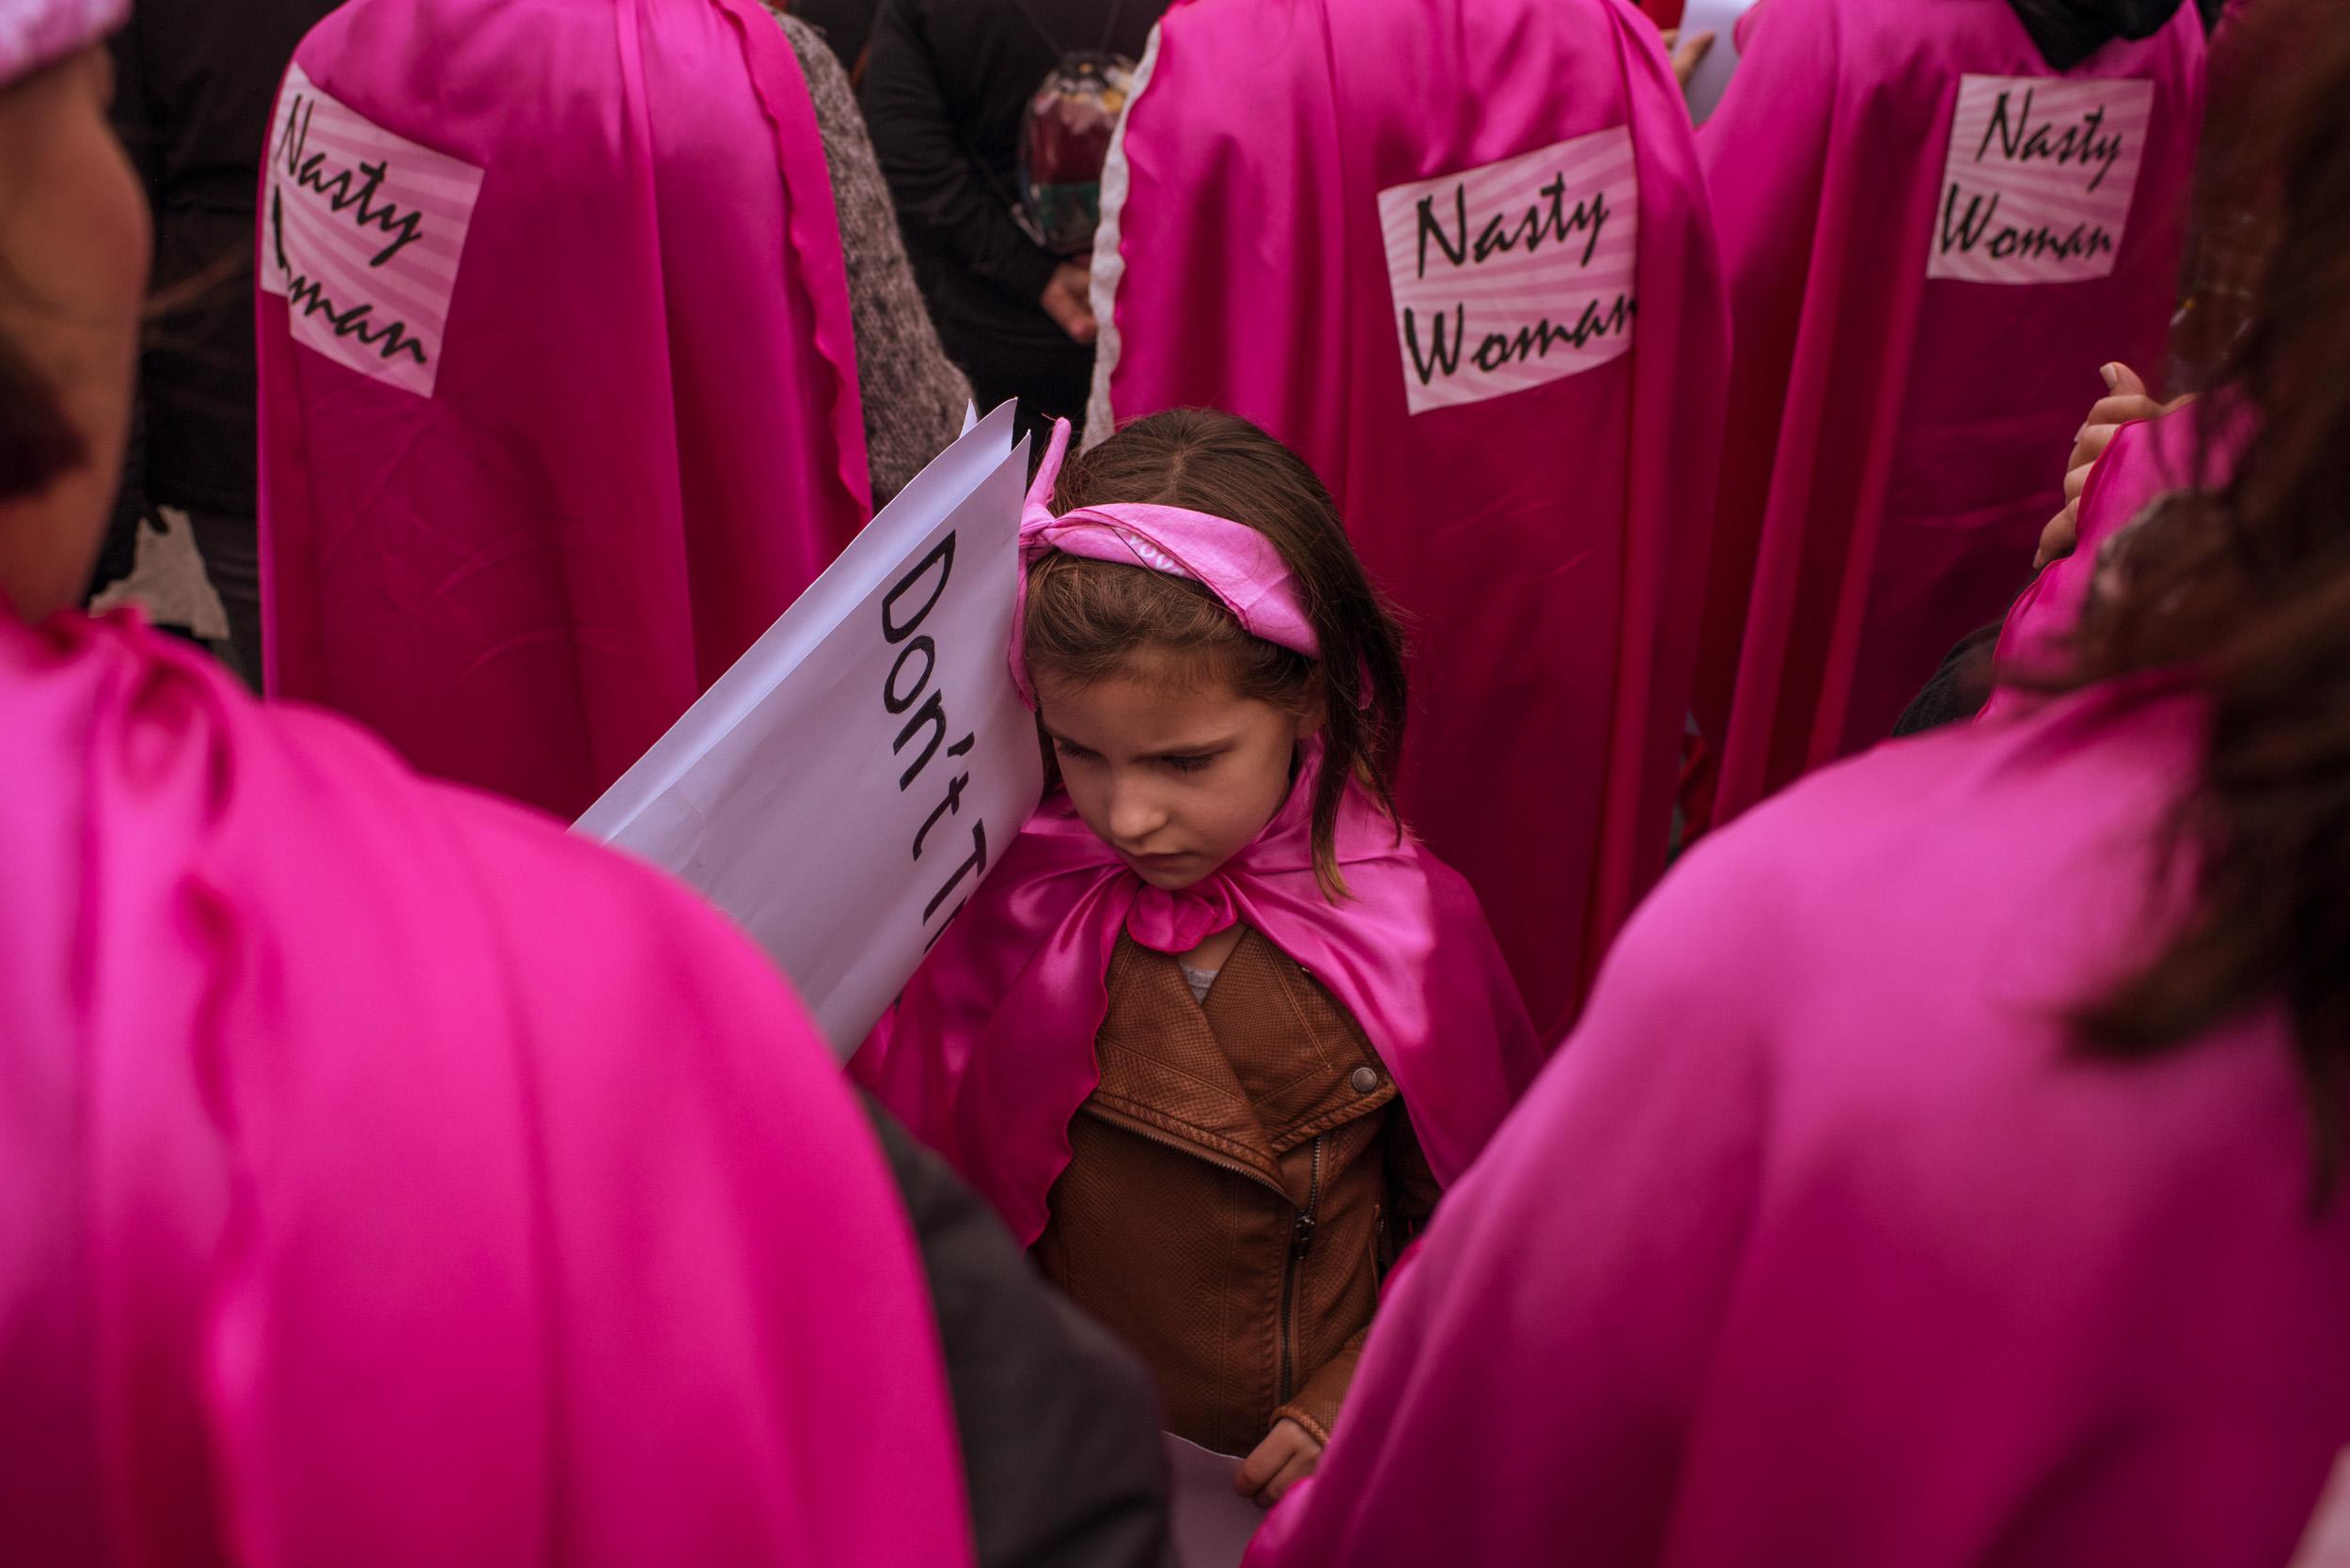 11_170121_Womens_March_359.jpg